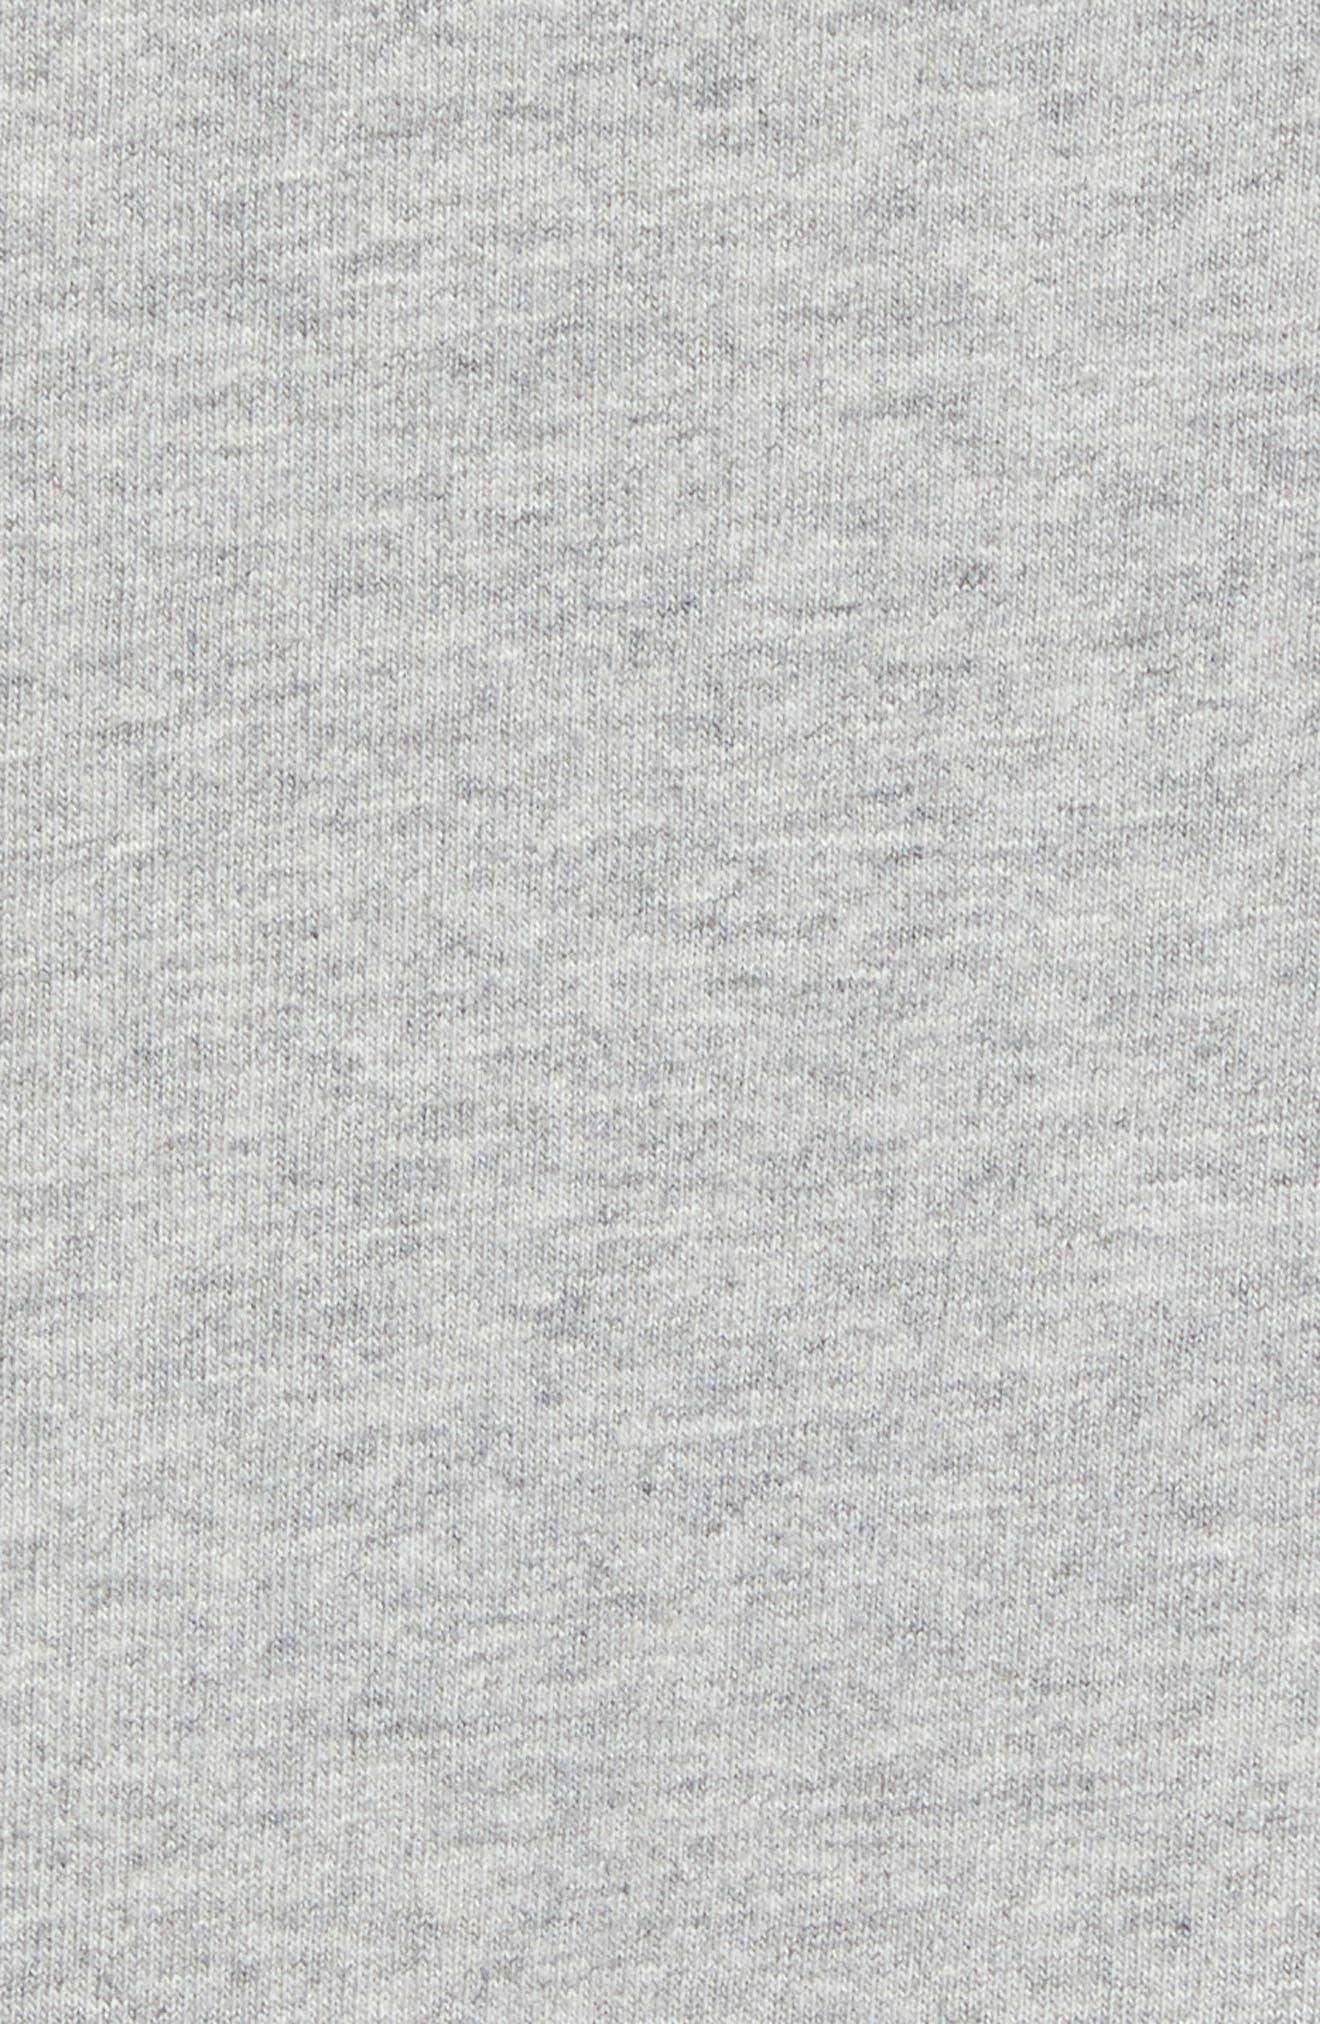 Bourbon of Proof Graphic T-Shirt,                             Alternate thumbnail 5, color,                             050